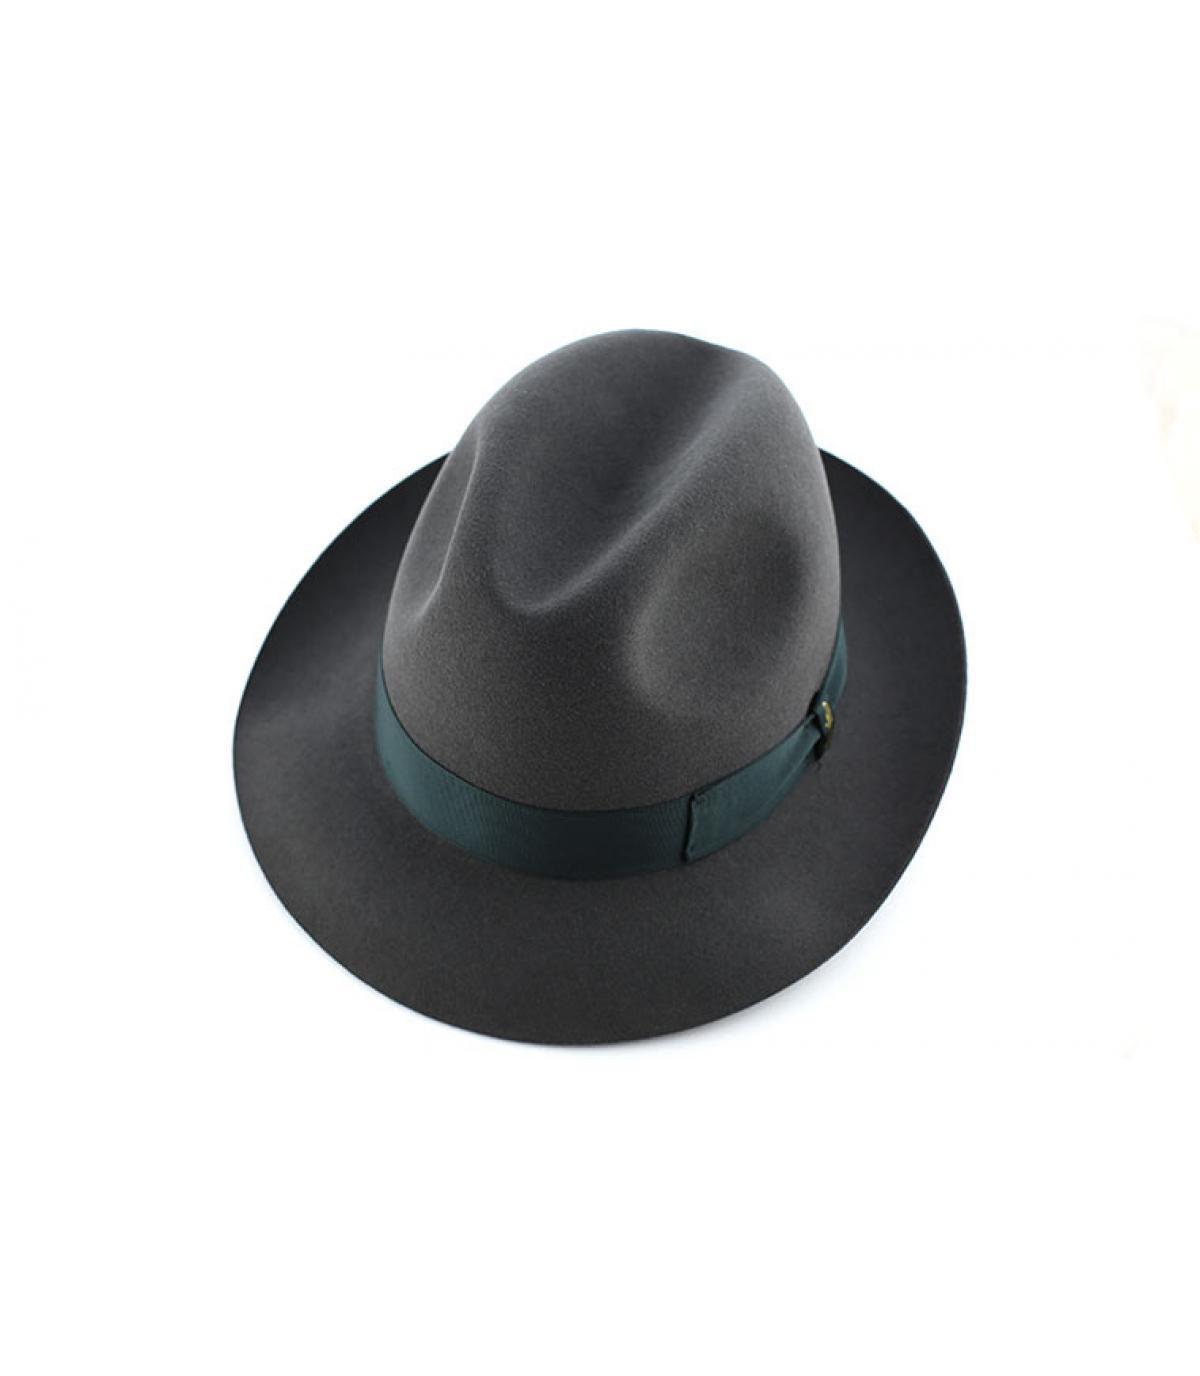 Details Marengo grey fur felt hat - afbeeling 3